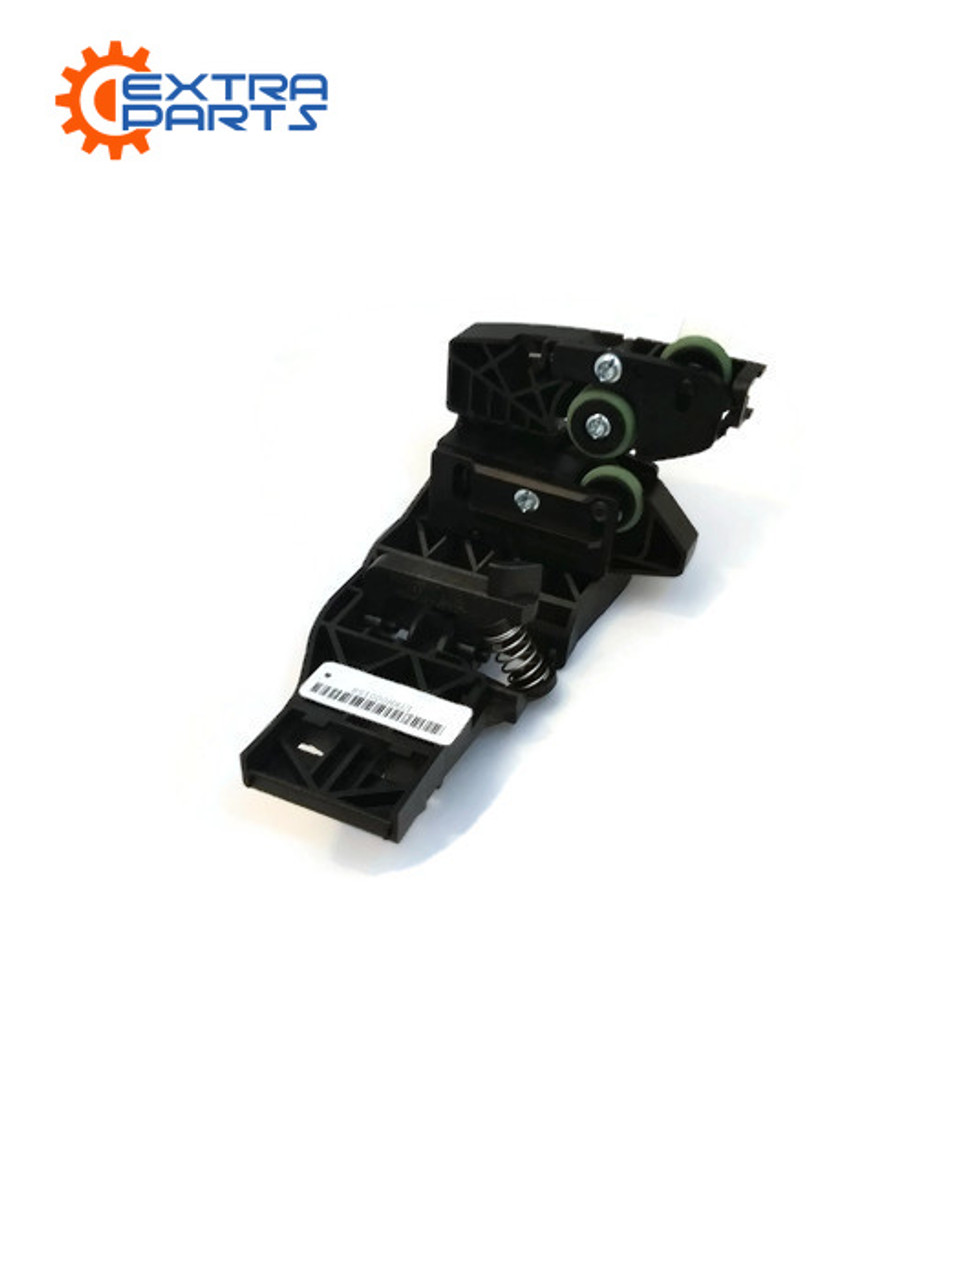 C7769-60163 C7769-60390 DesignJet 500 800 Plotter Cutter Assy For HP  DesignJet 500/800 Series